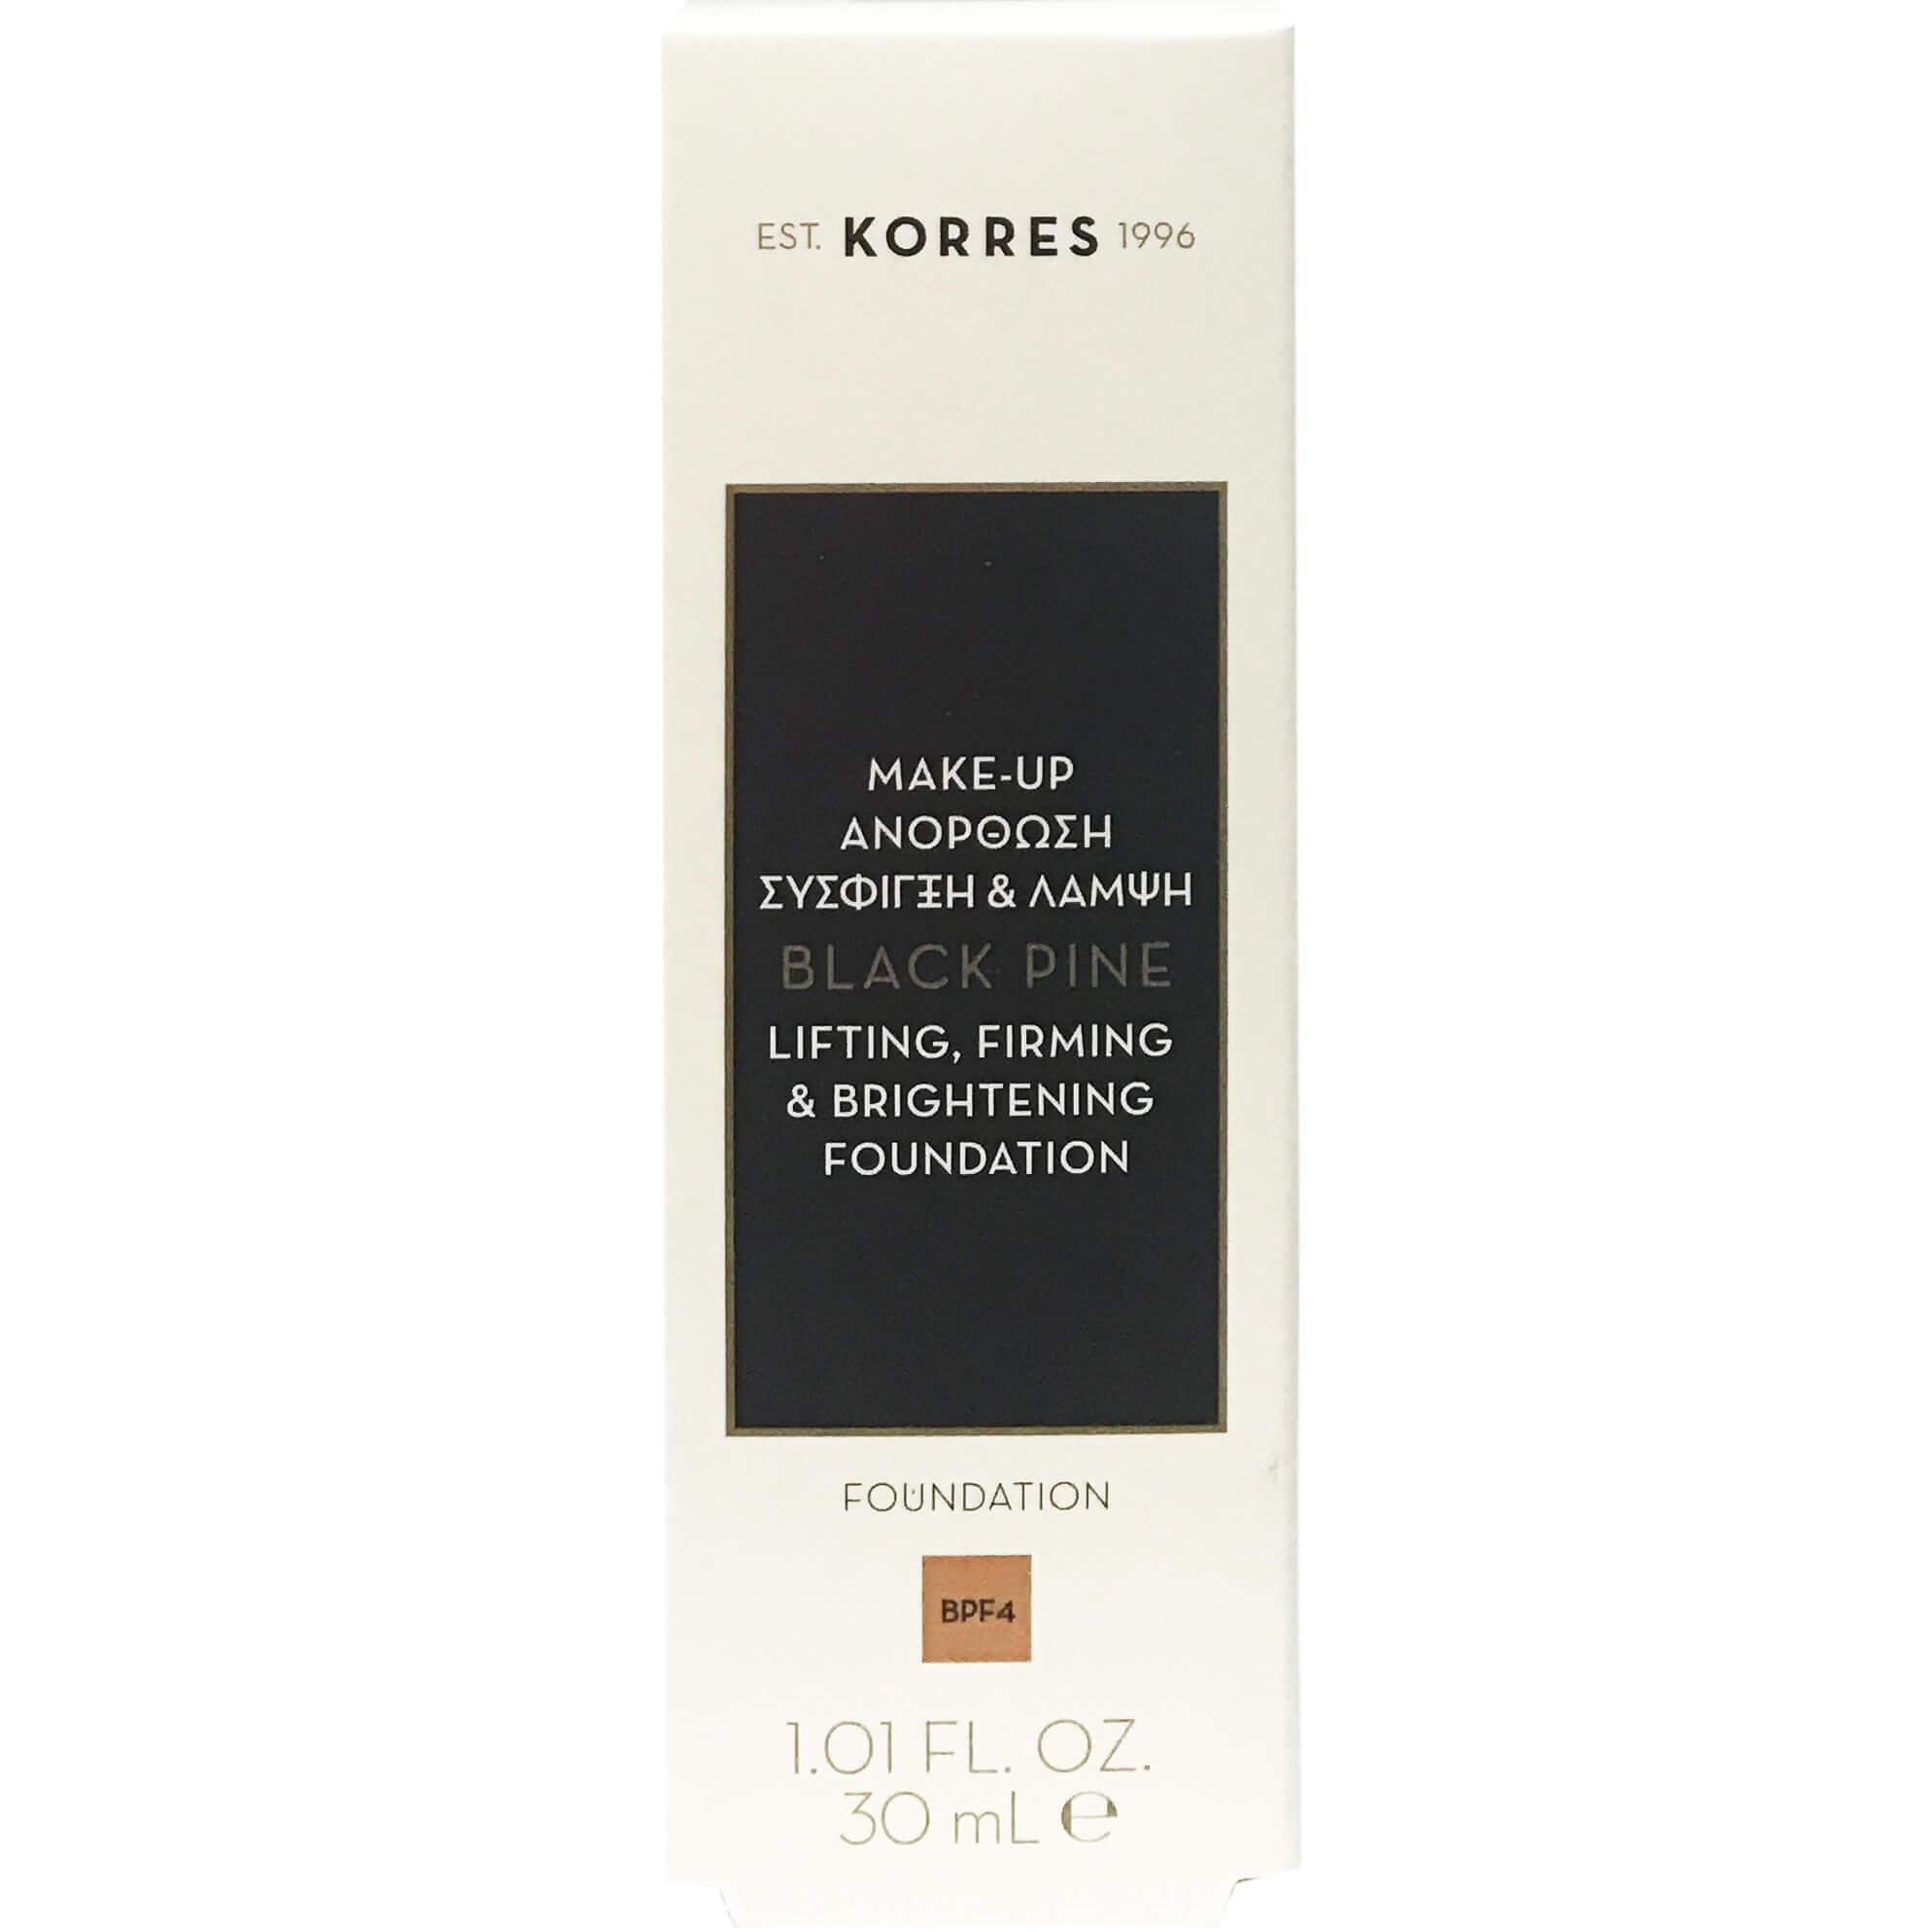 Korres Μαύρη ΠεύκηFoundation Make-up Ανόρθωσης, Σύσφιξης & Λάμψης30ml – BPF4